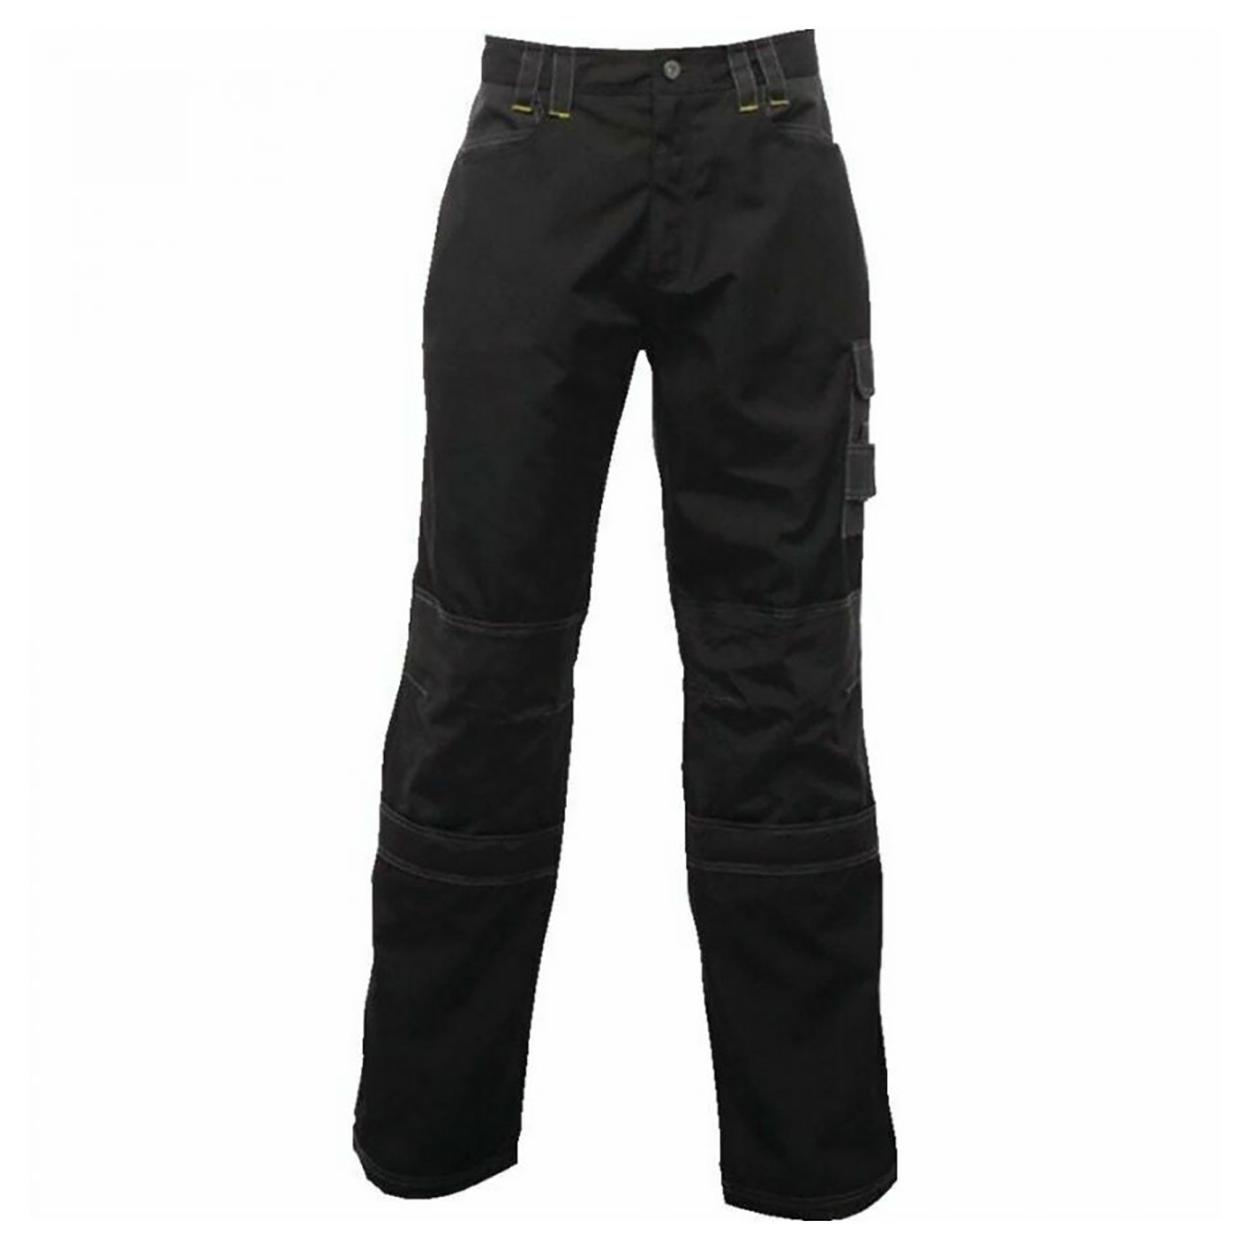 Regatta-Mens-Holster-Workwear-Trousers-Short-Regular-And-Long-UTRW3202